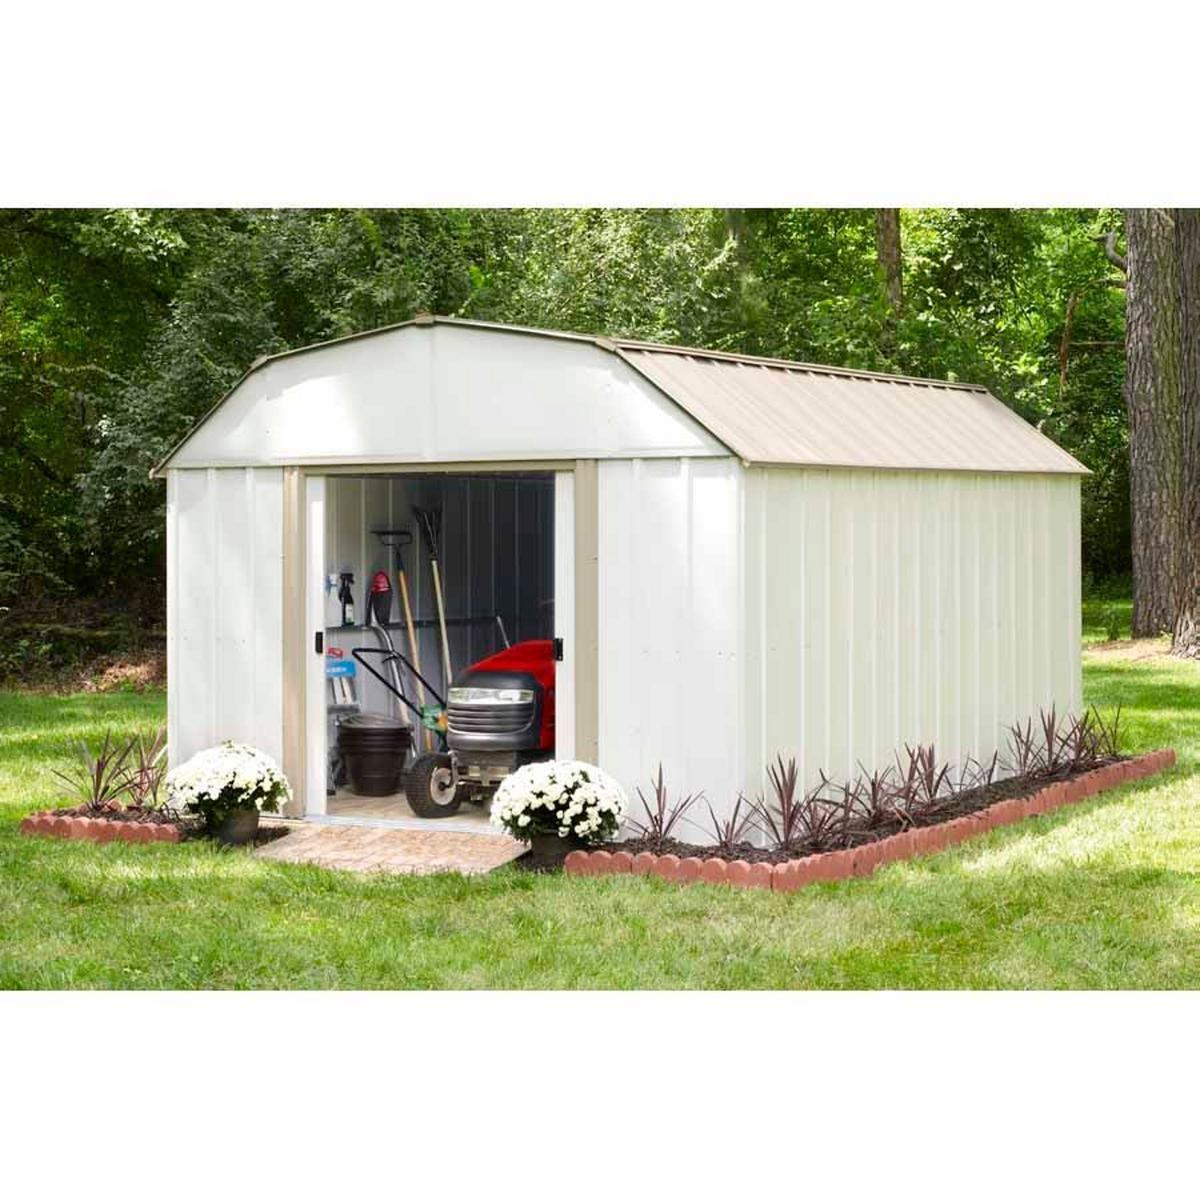 Arrow SR1012 10' x 12' Barn Roof Storage Shed Sears